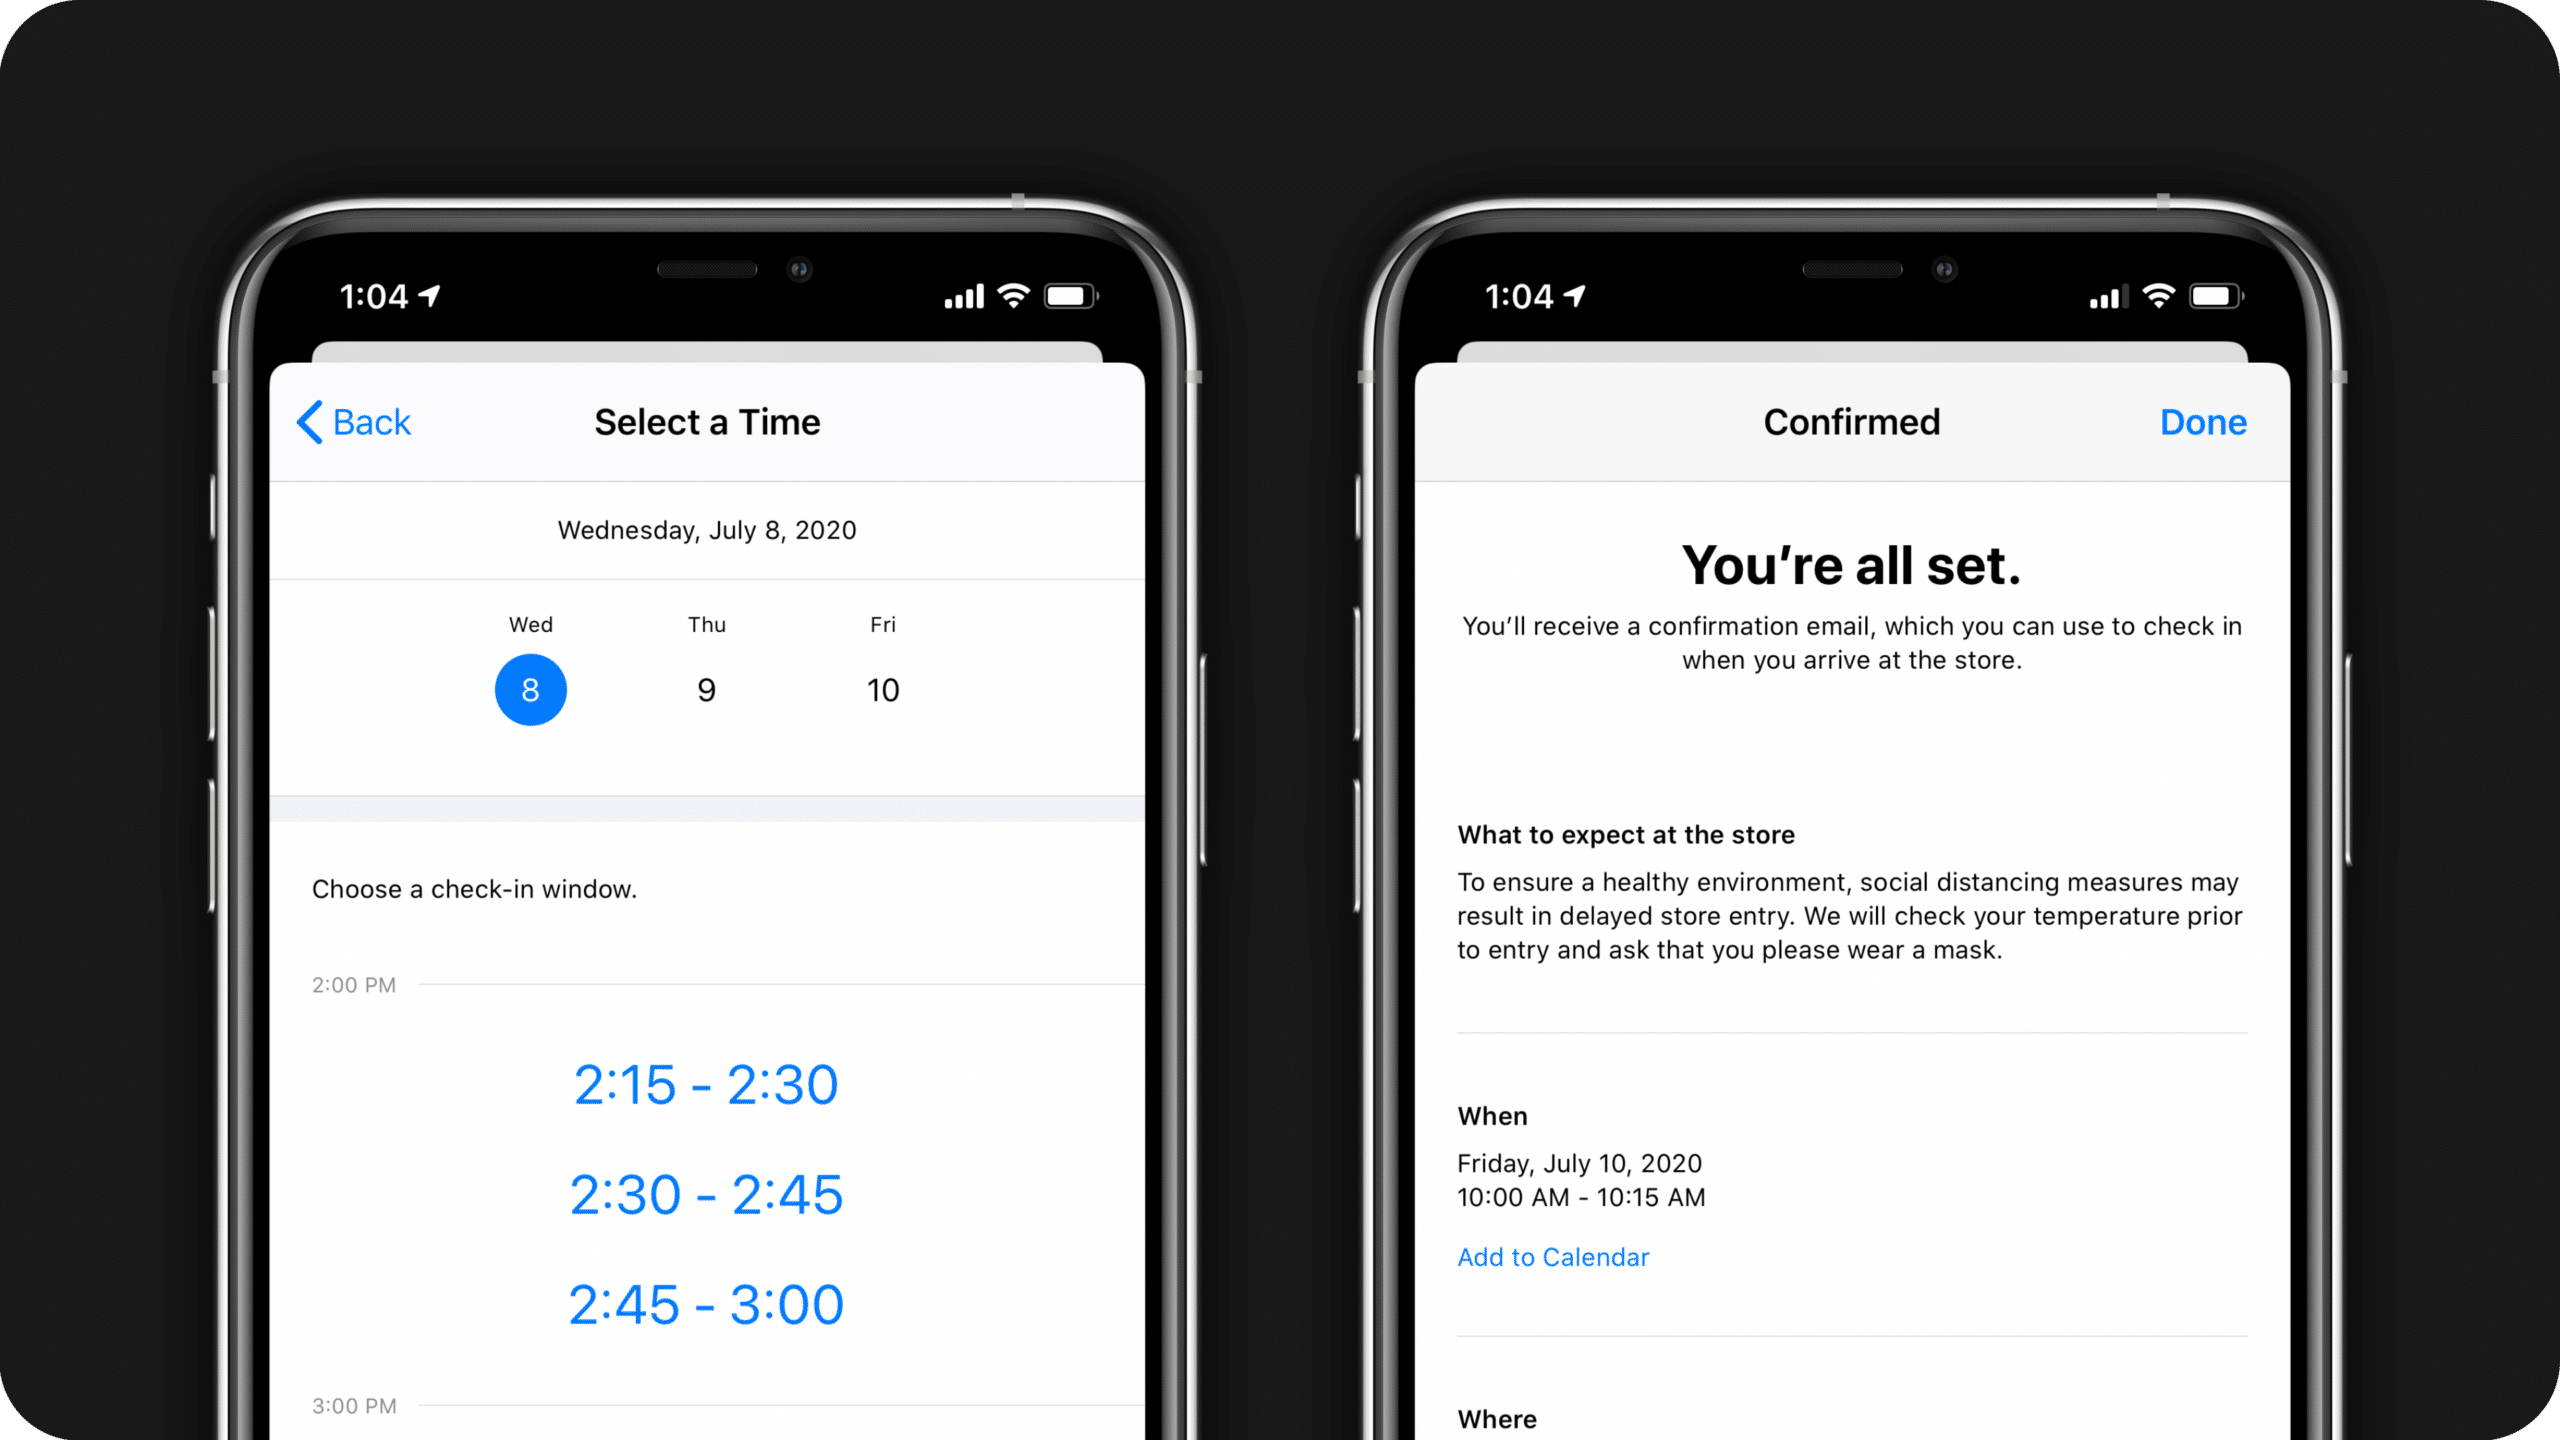 Agendamento no app Apple Store